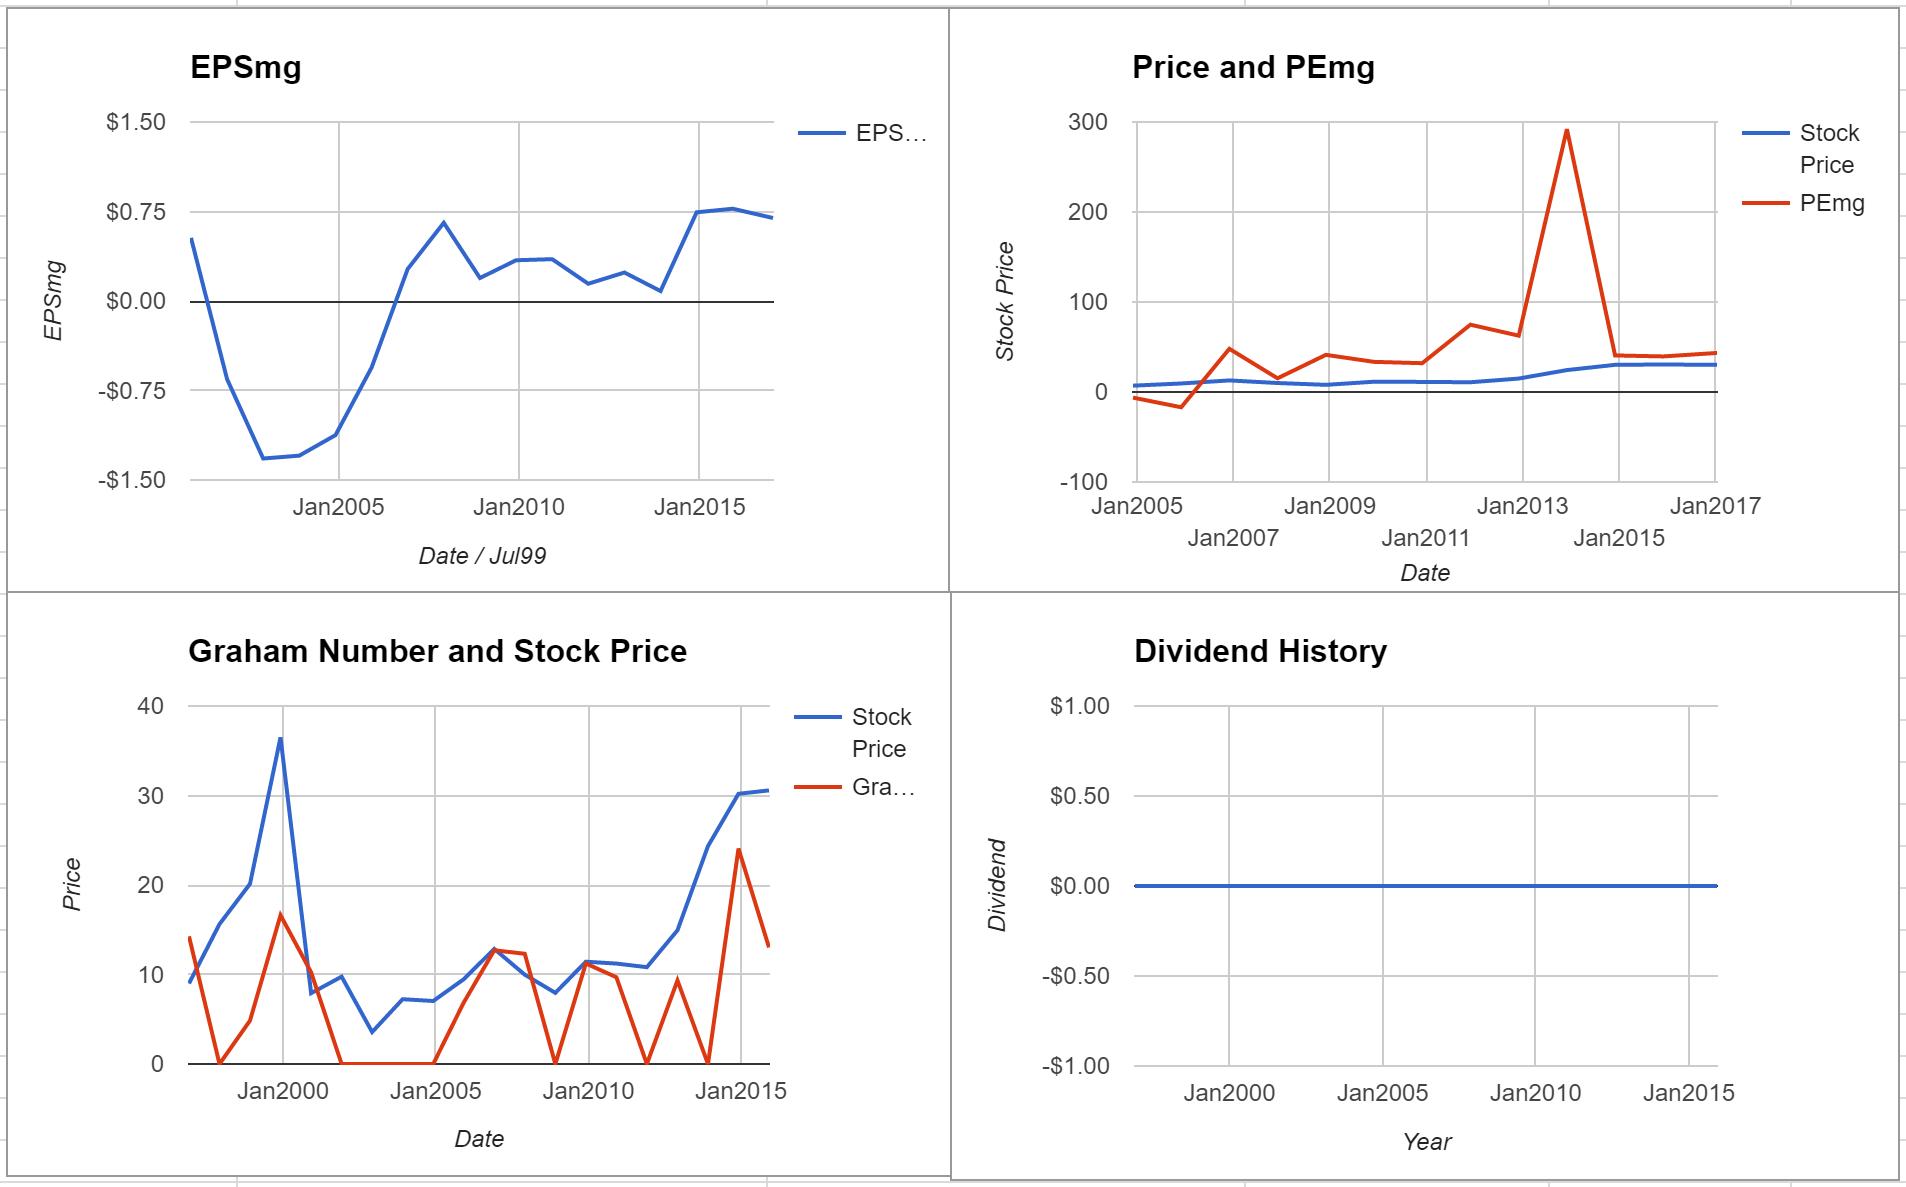 ARRIS International PLC Valuation – January 2017 $ARRS